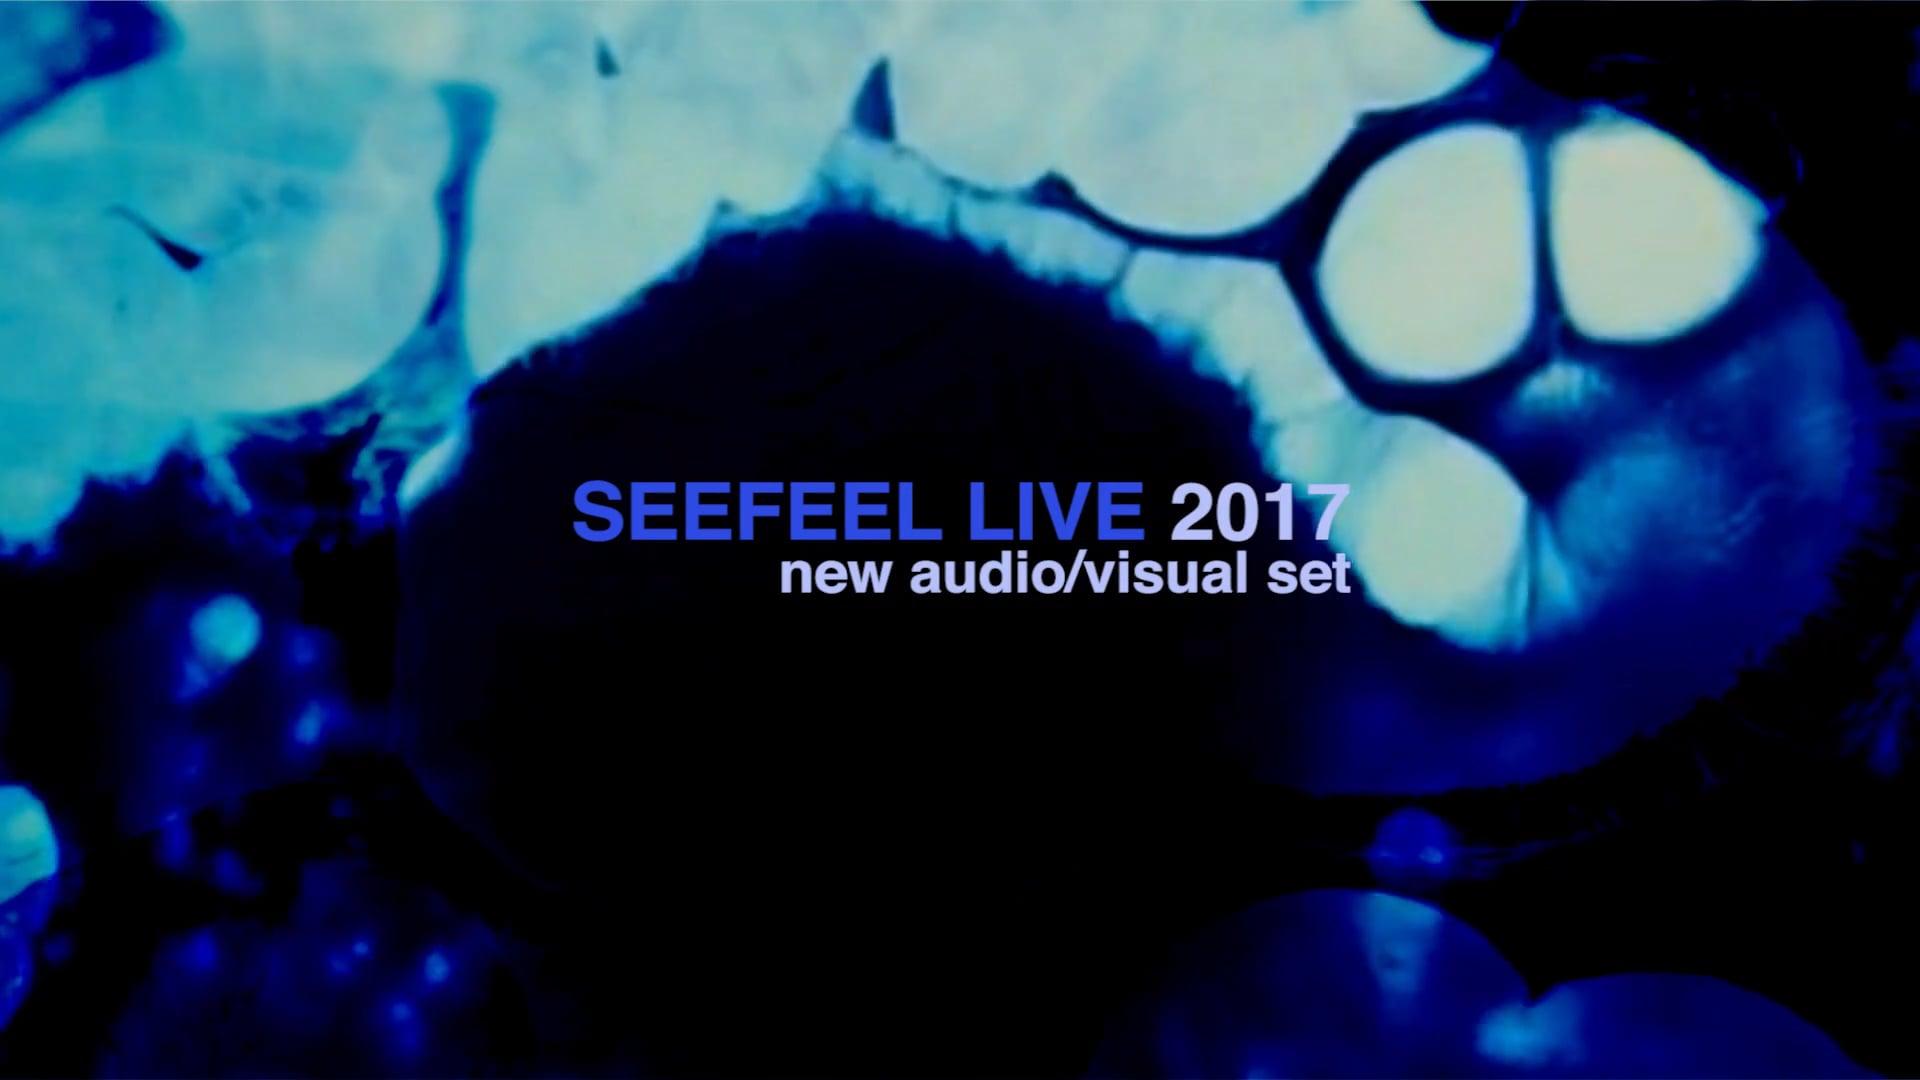 SEEFEEL LIVE 2017